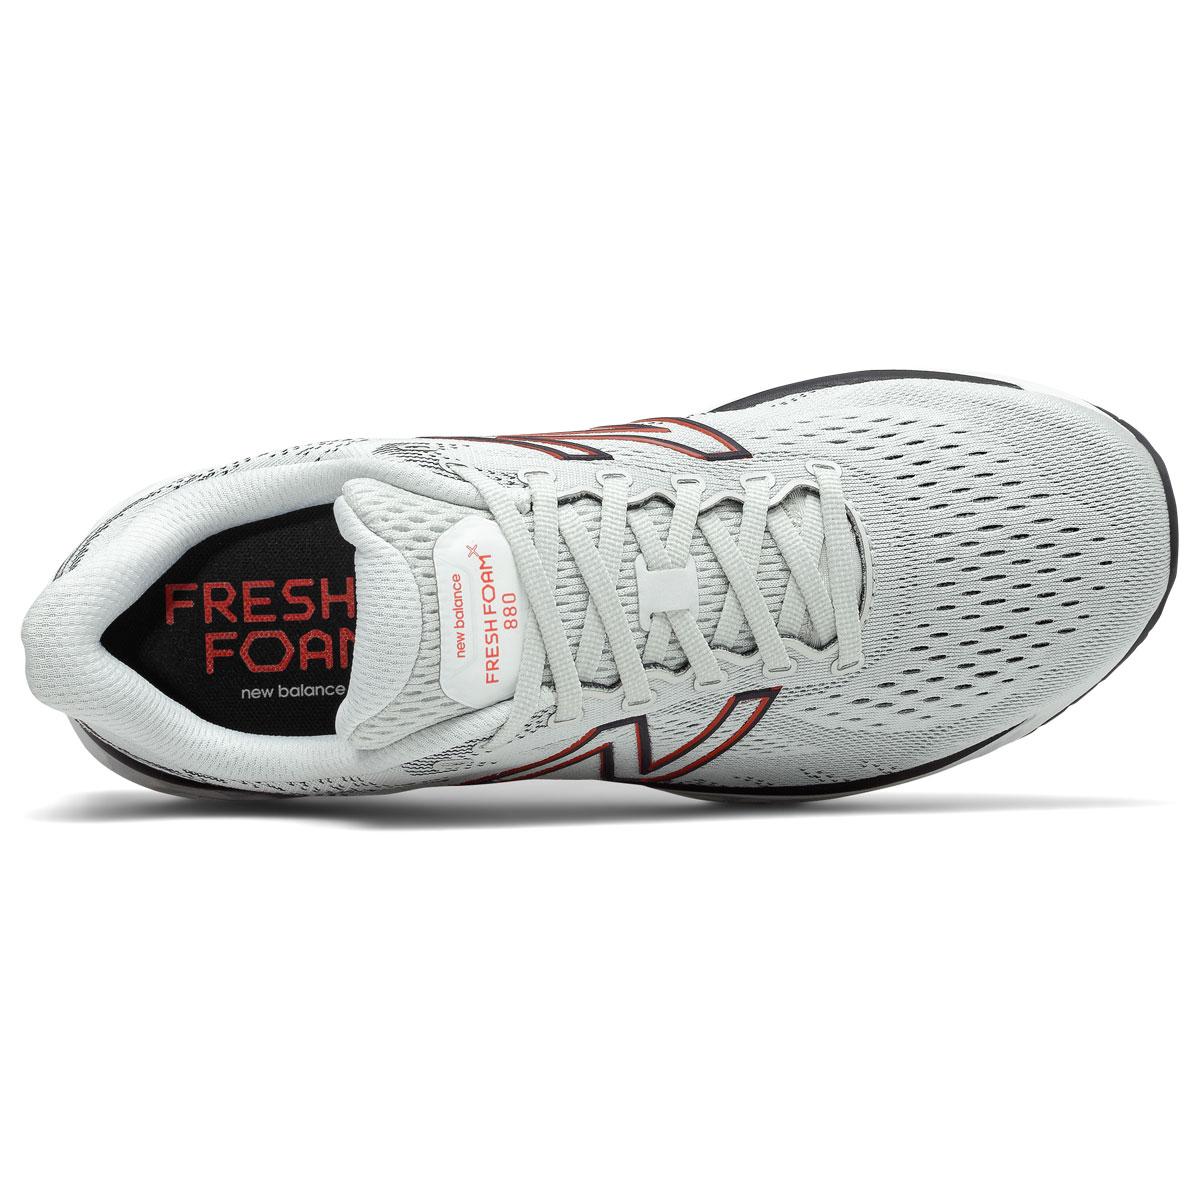 Men's New Balance Fresh Foam 880v11 Running Shoe - Color: Arrowroot/Ghost Pepper - Size: 7 - Width: Wide, Arrowroot/Ghost Pepper, large, image 3